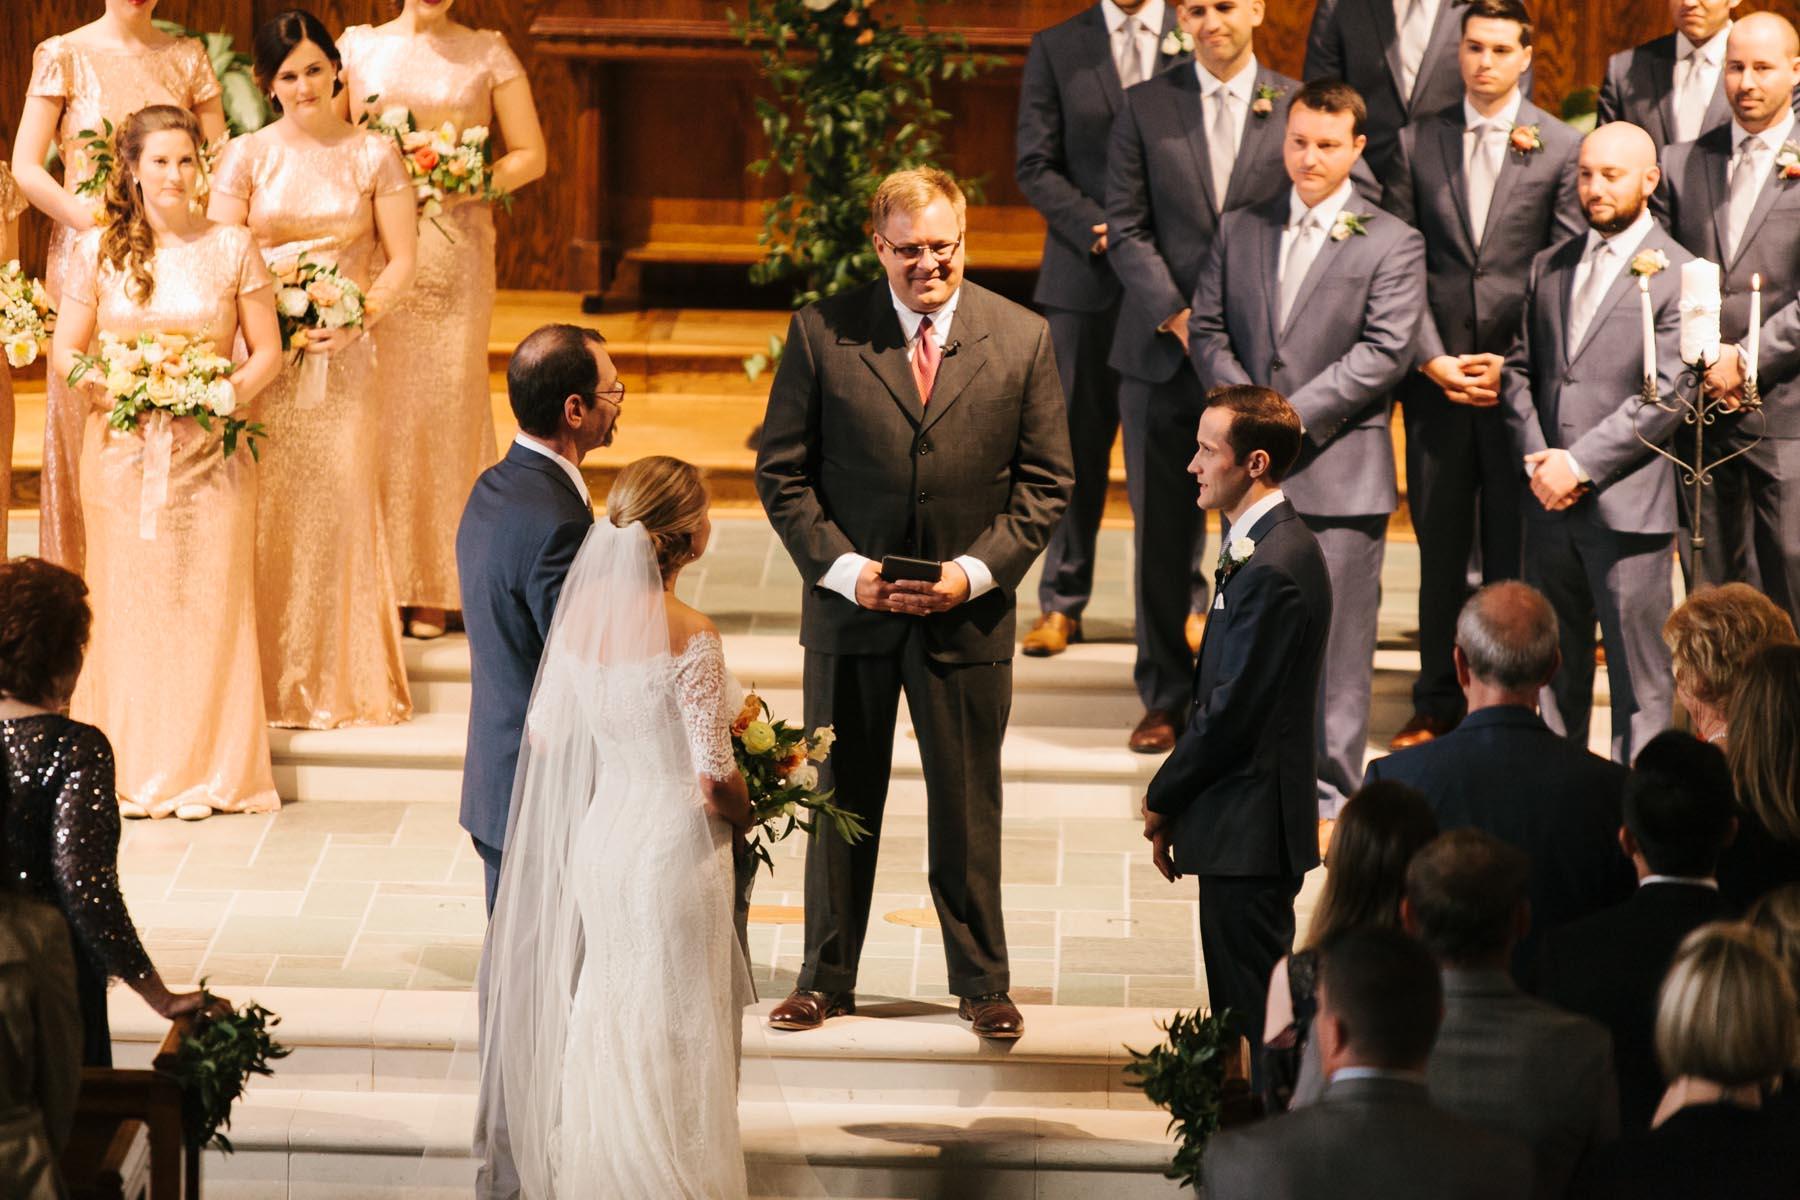 kjellman wedding blog biltmore wedding -79